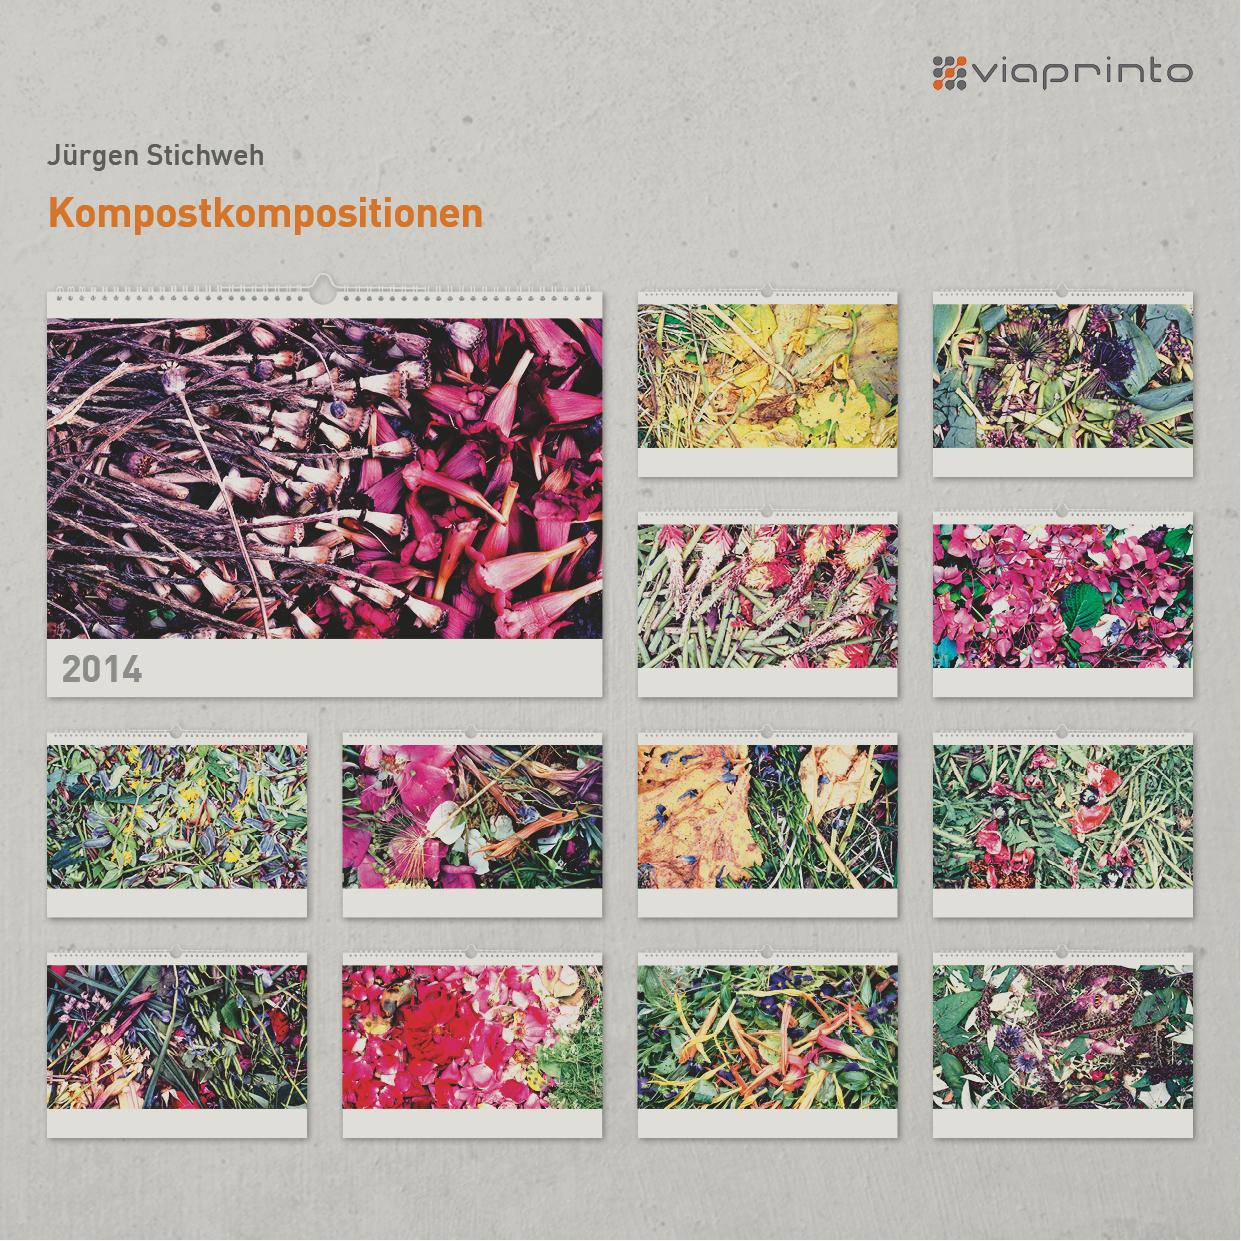 https://www.viaprinto.de/motivkalender#/kompostkompositionen